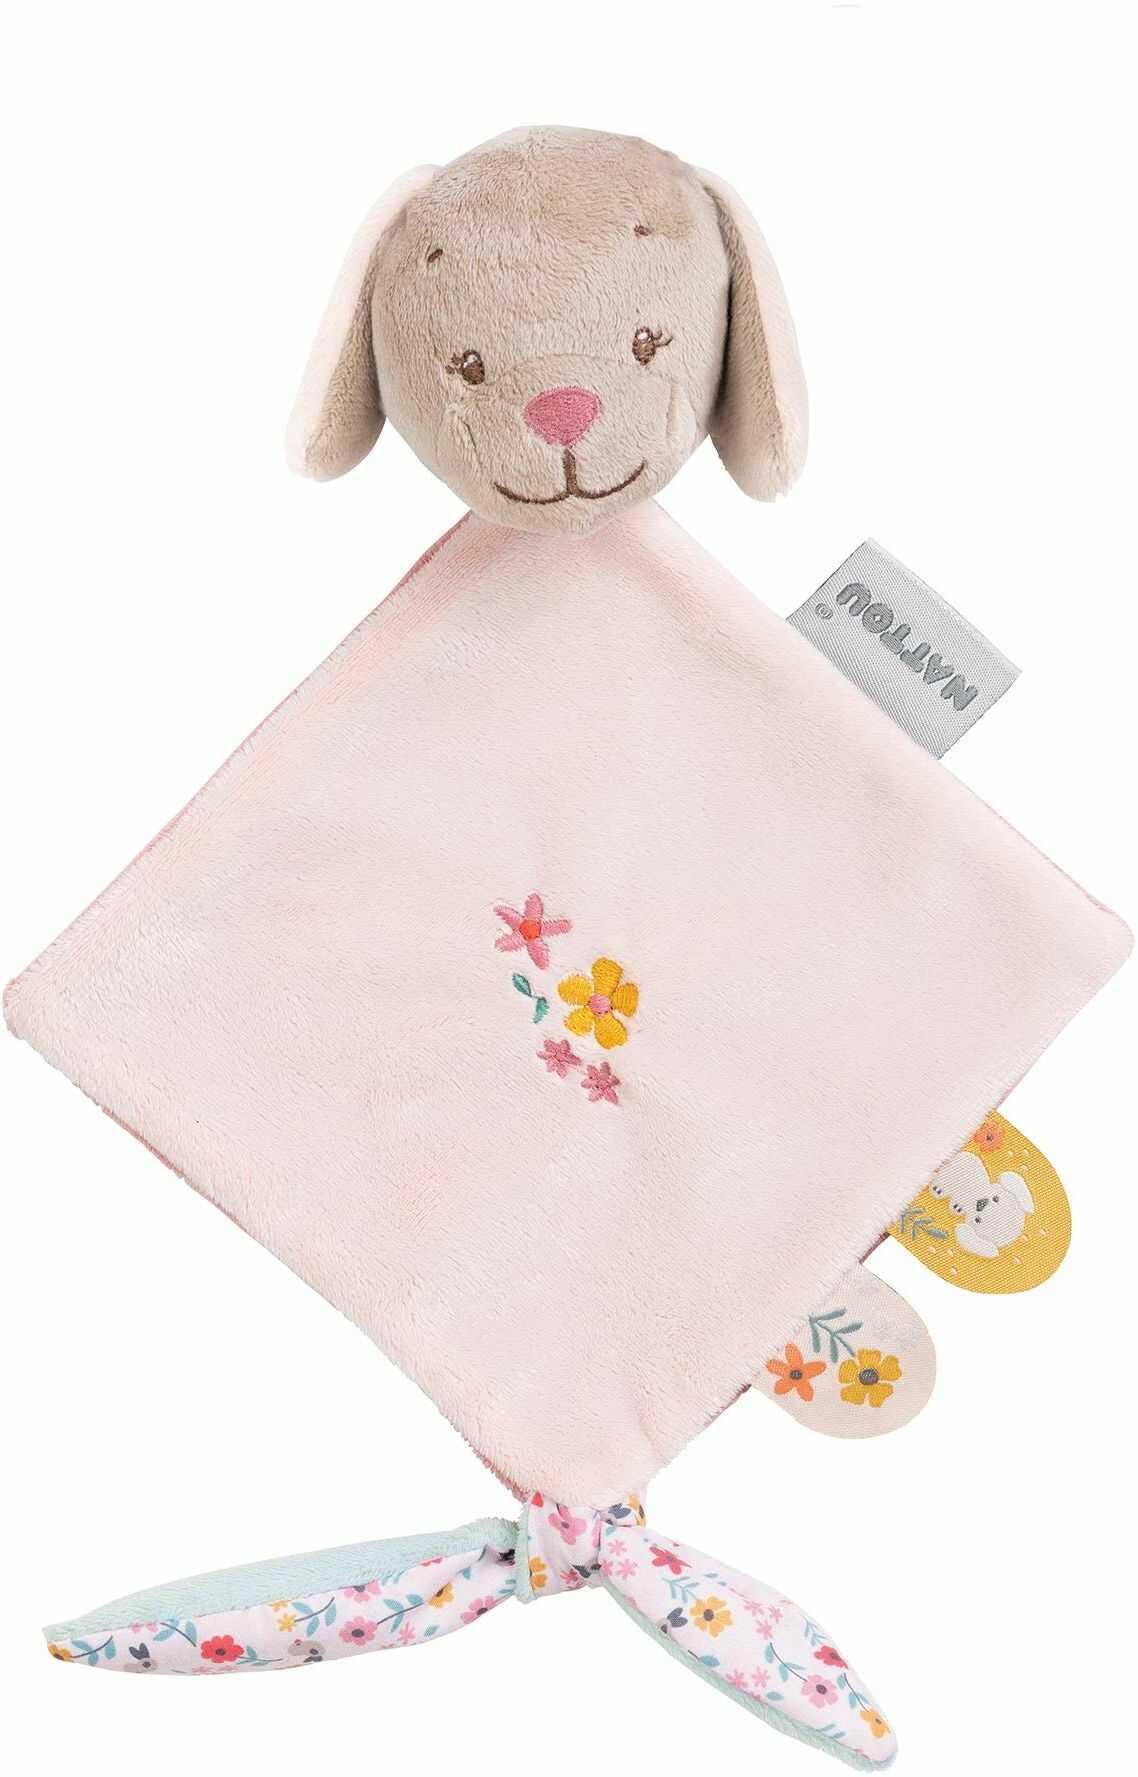 Nattou Mini-chusteczka na smoczek Hündin Lali, Iris i Lali, 30 x 20 x 5 cm, beżowa/różowa